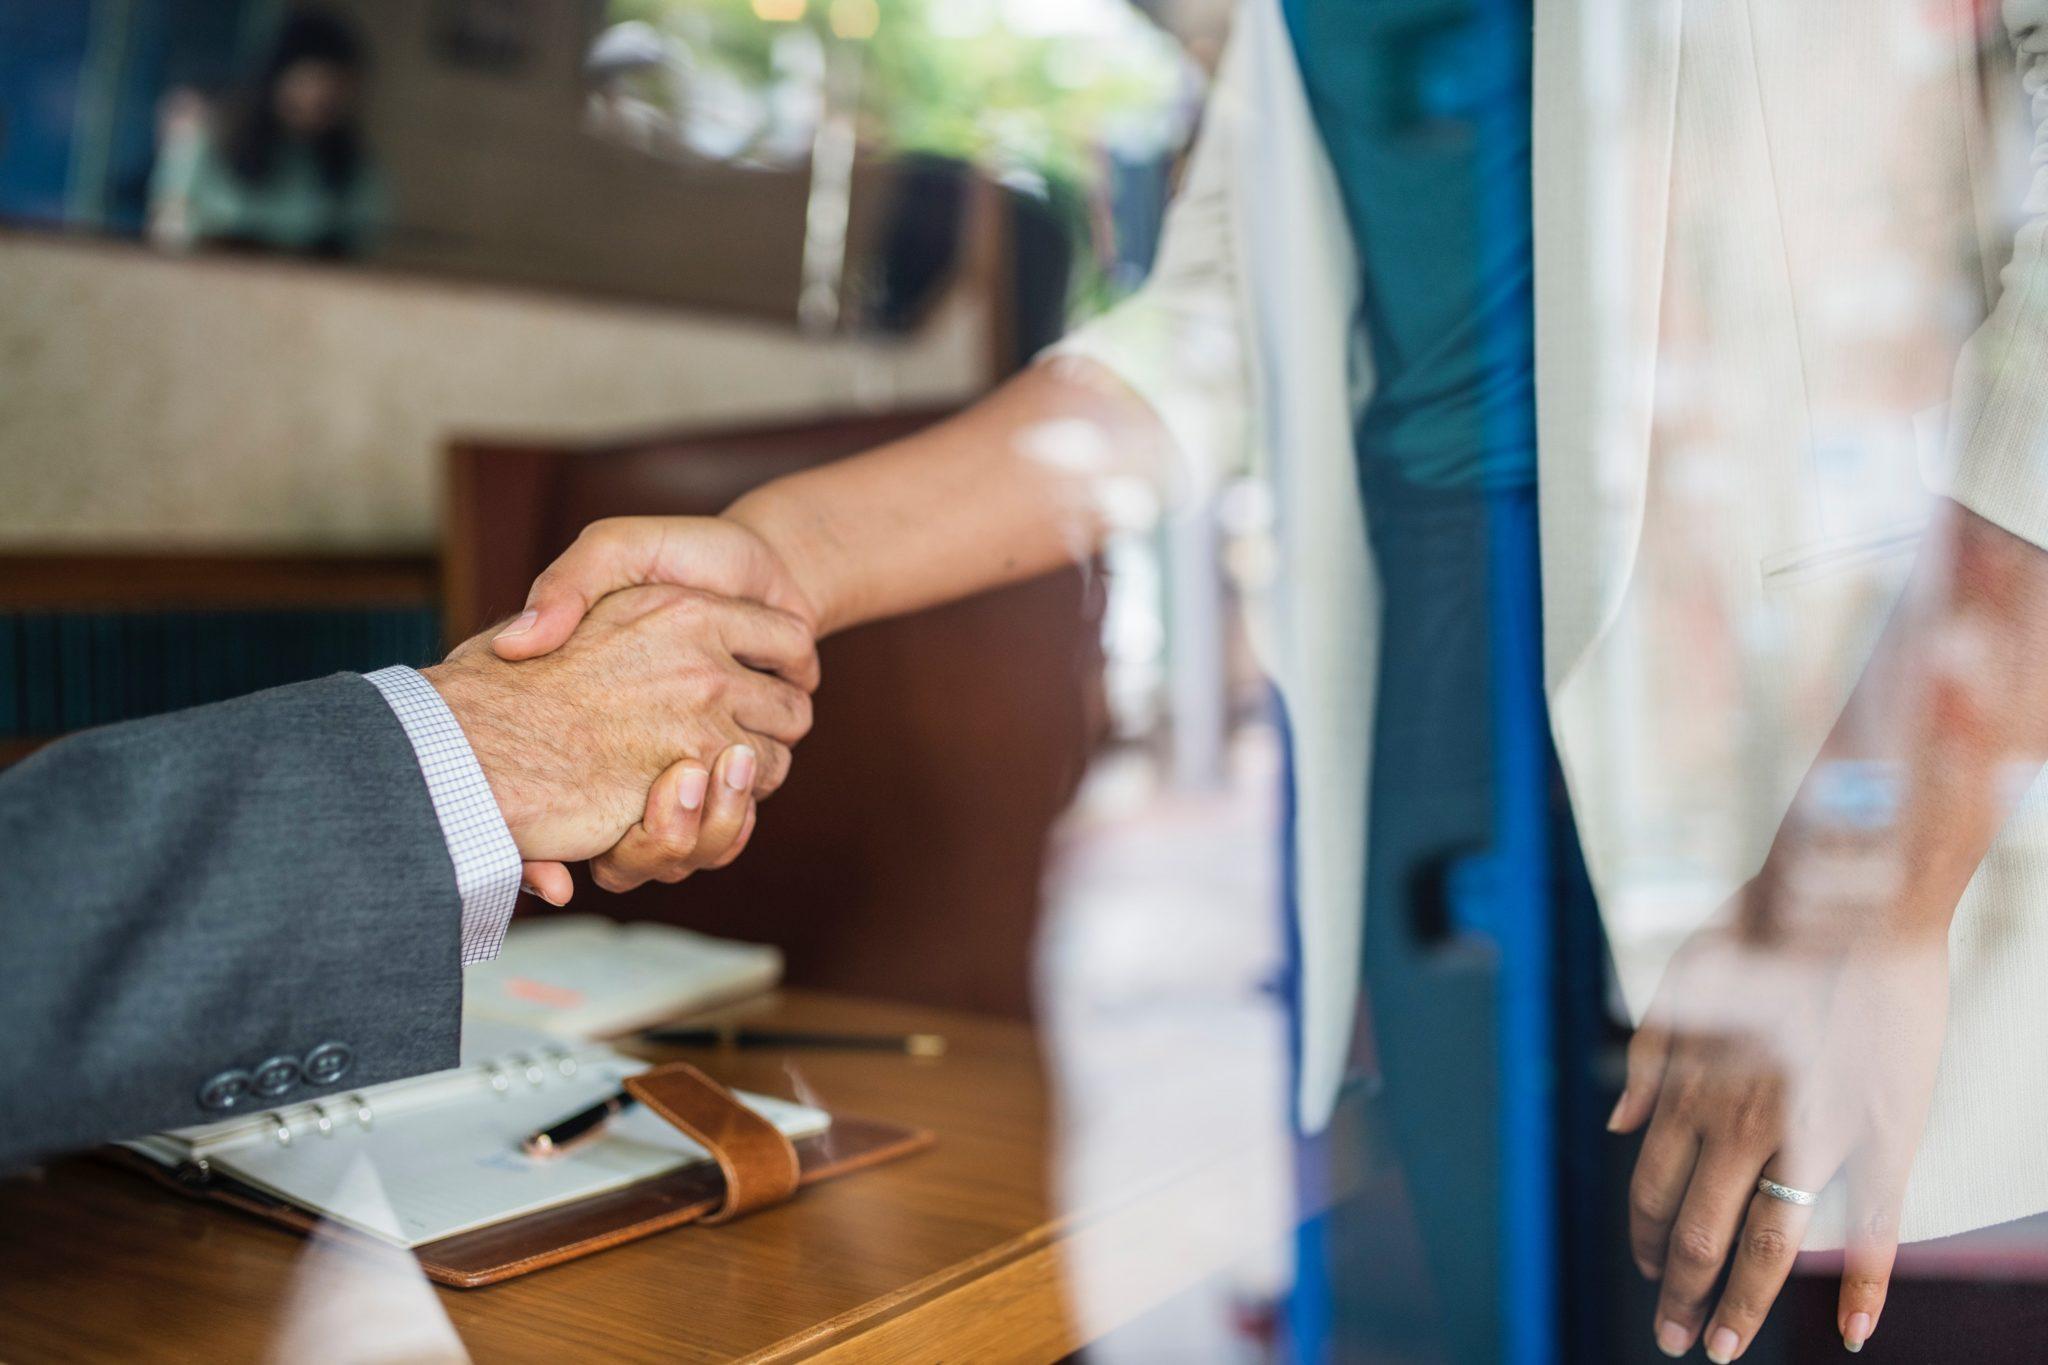 first-introduction-handshake-between-man-woman